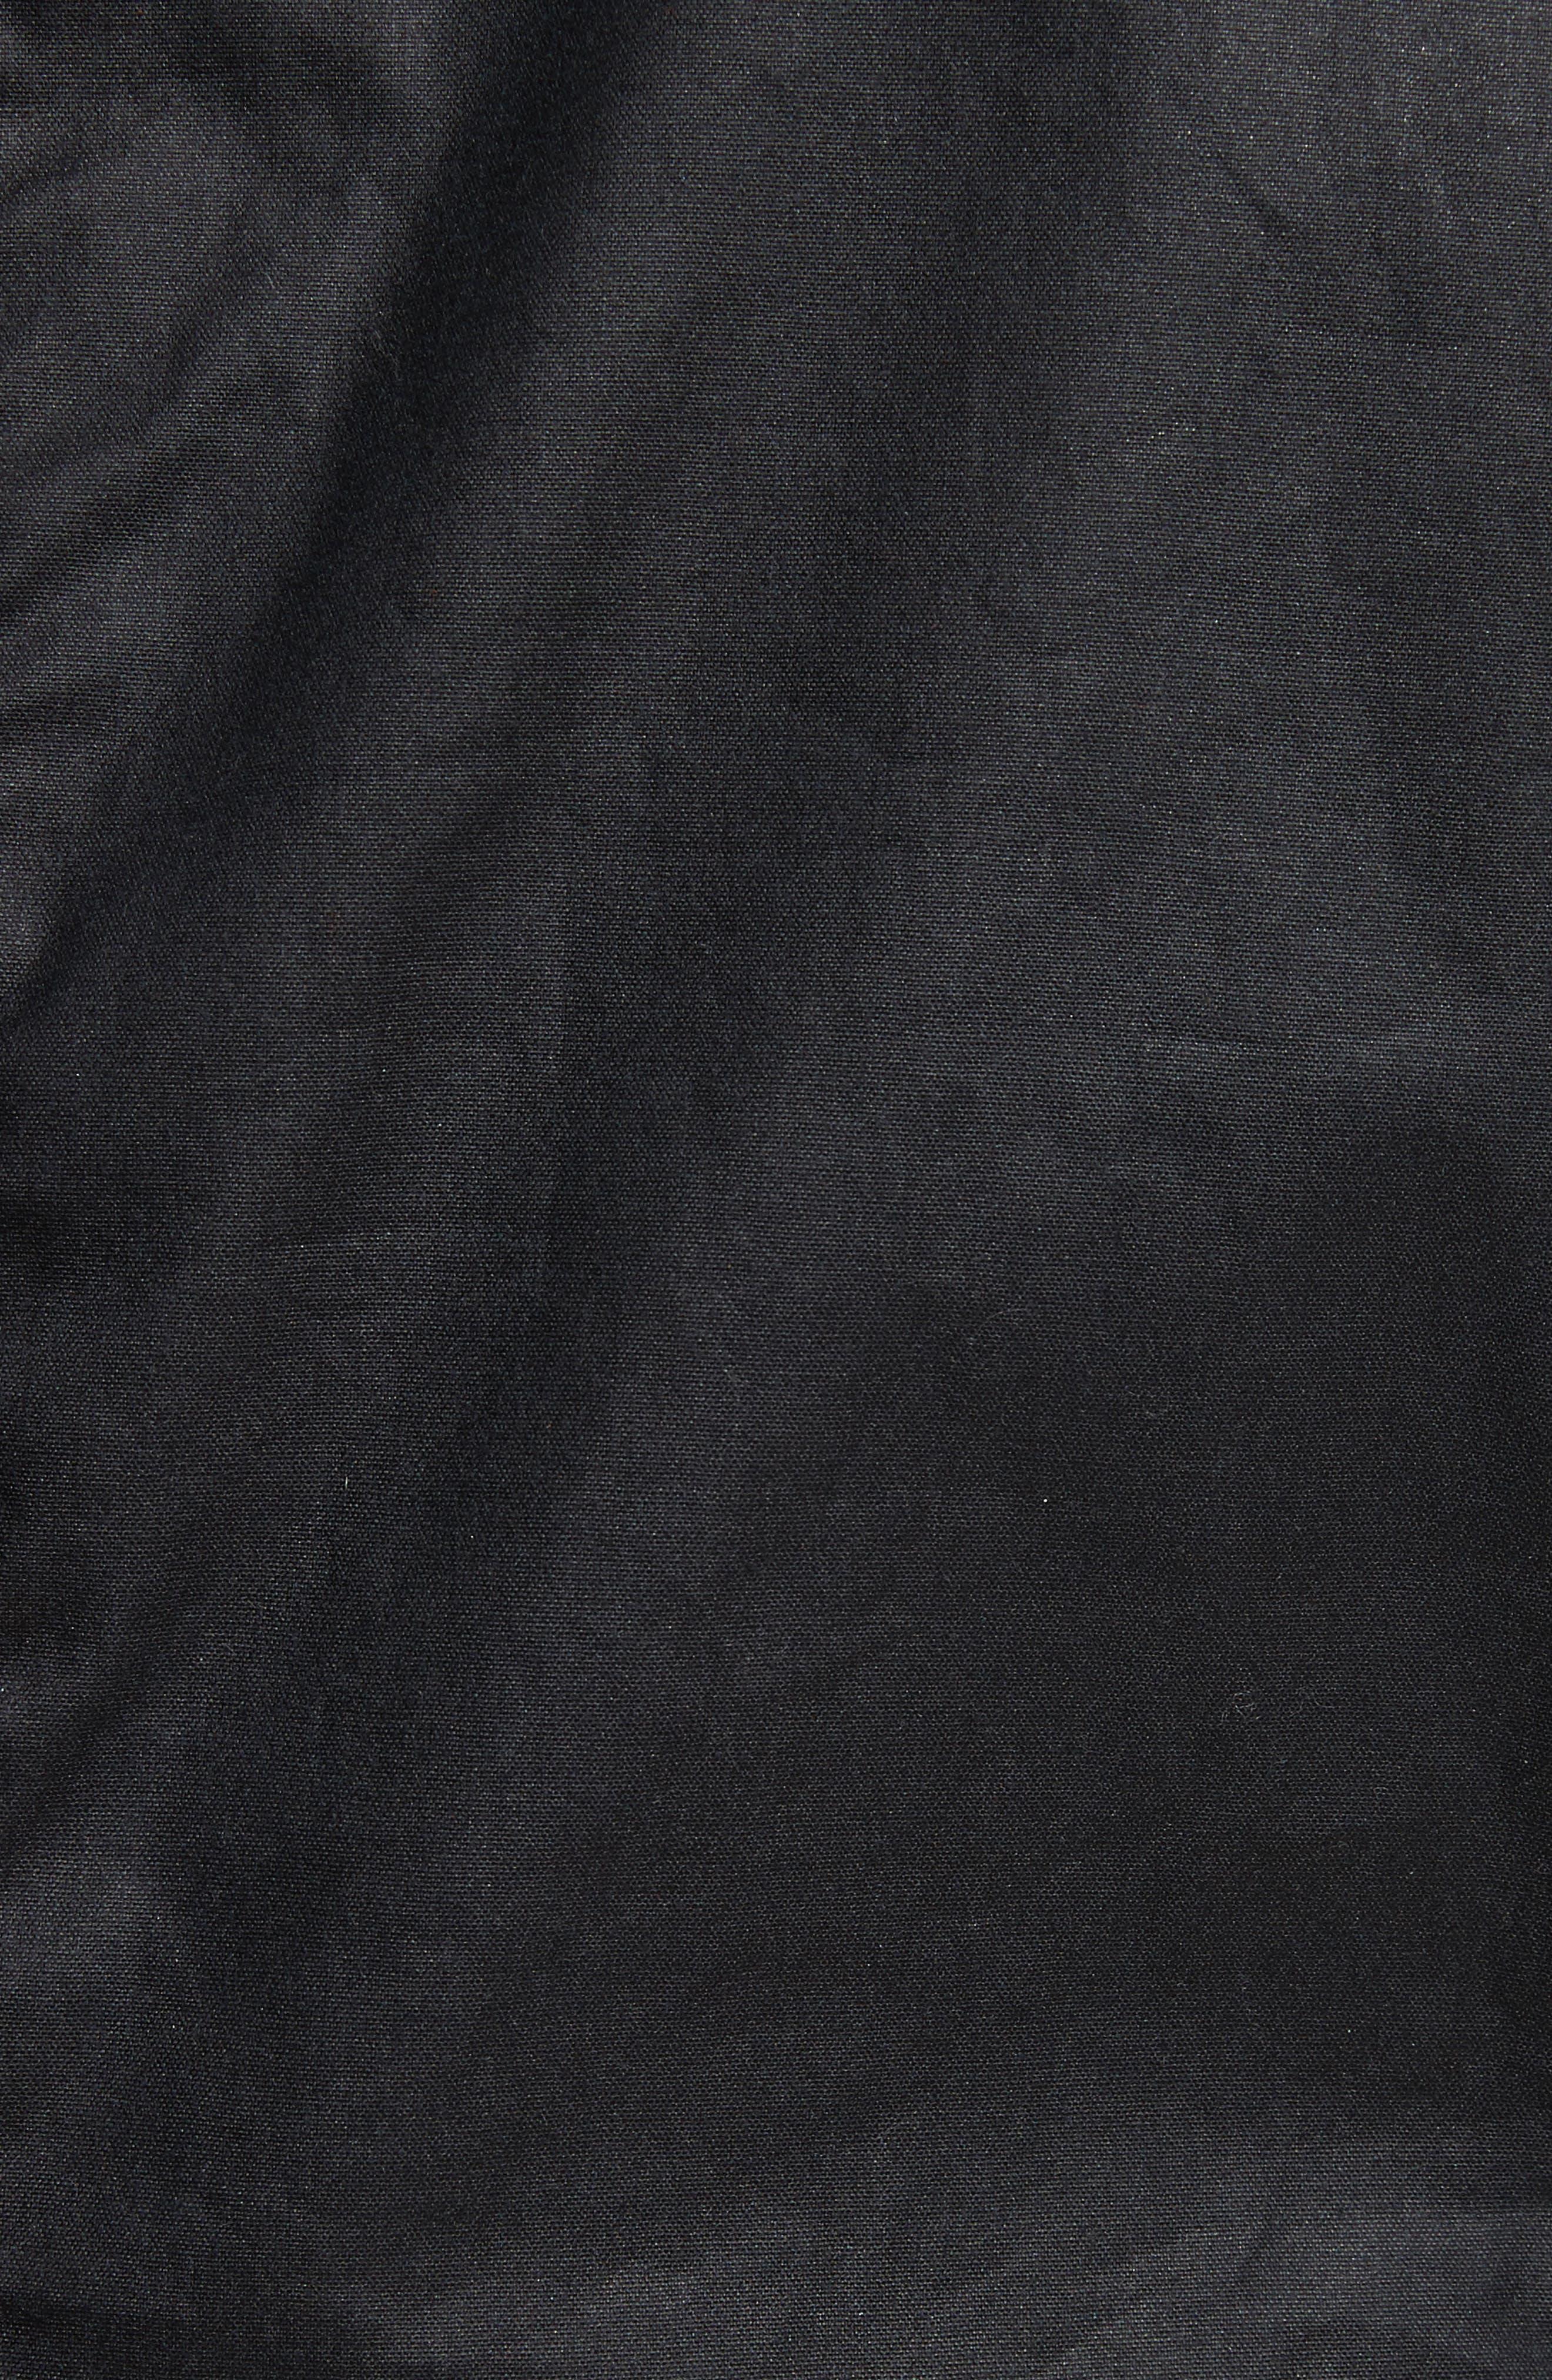 Kelland Coated Cotton Moto Jacket,                             Alternate thumbnail 6, color,                             DARK NAVY